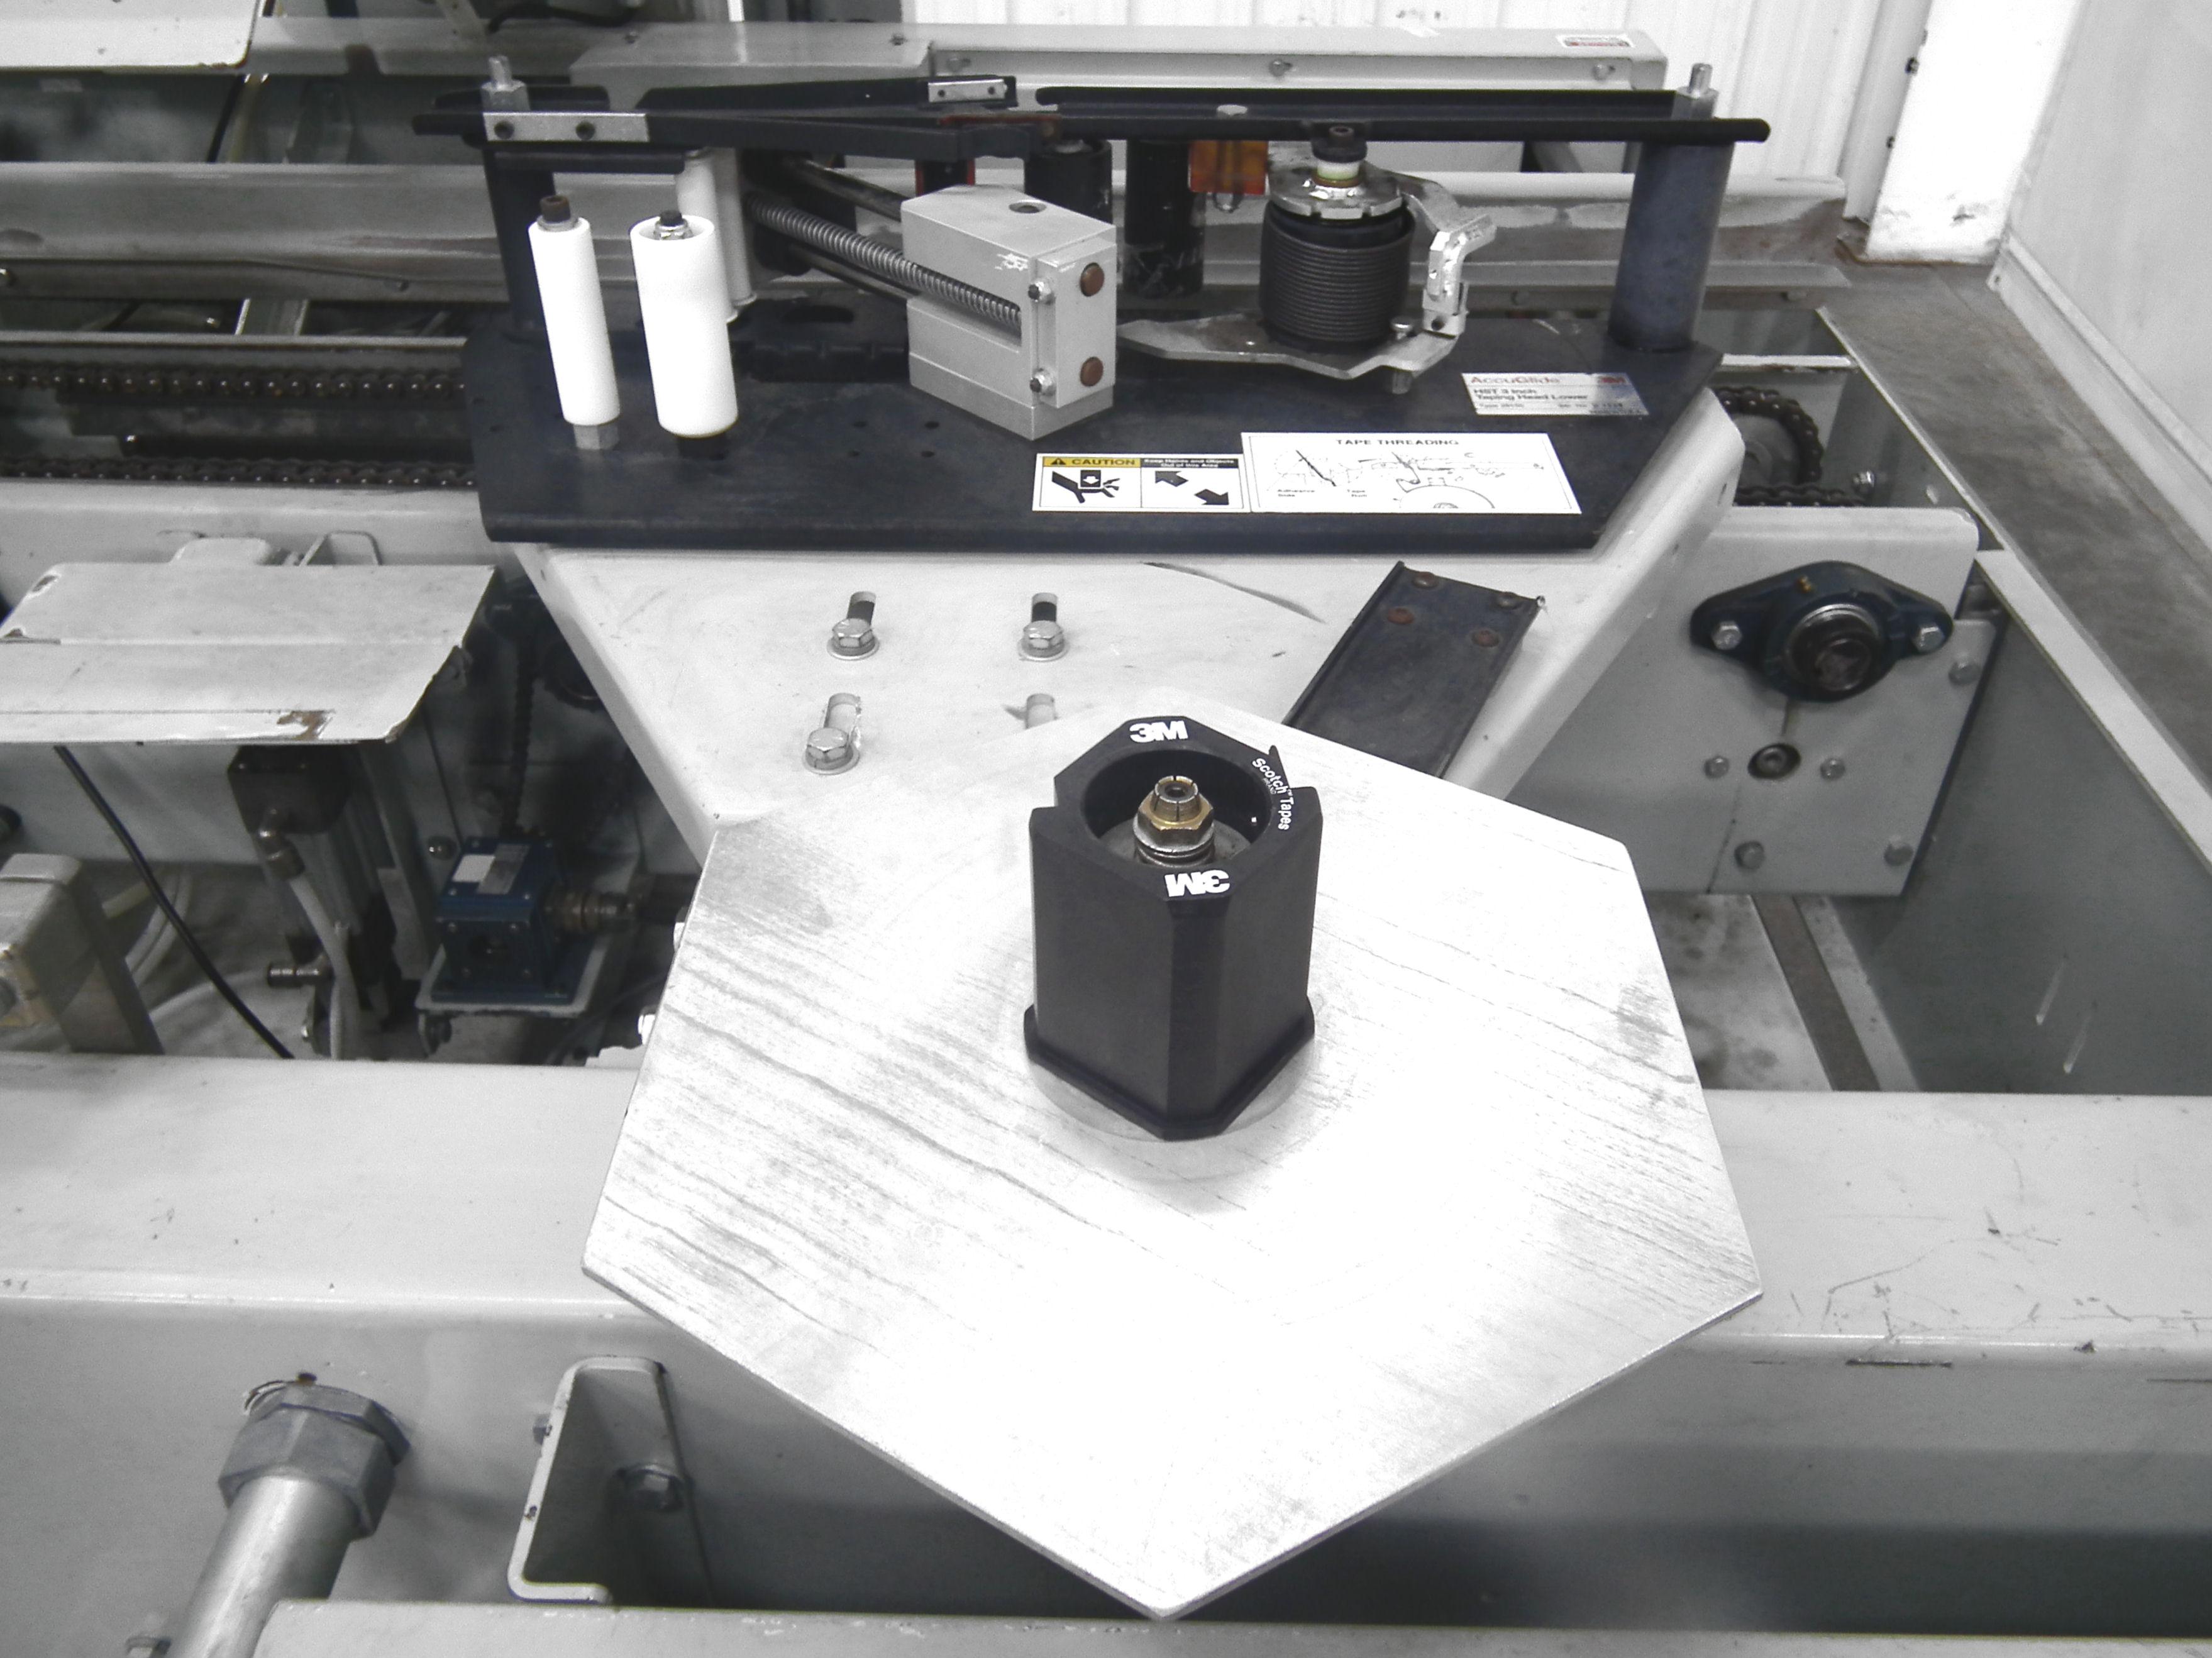 Marq Tuff HPE-NS-MF/RH/DL Bottom Tape Case Erector A9697 - Image 6 of 15